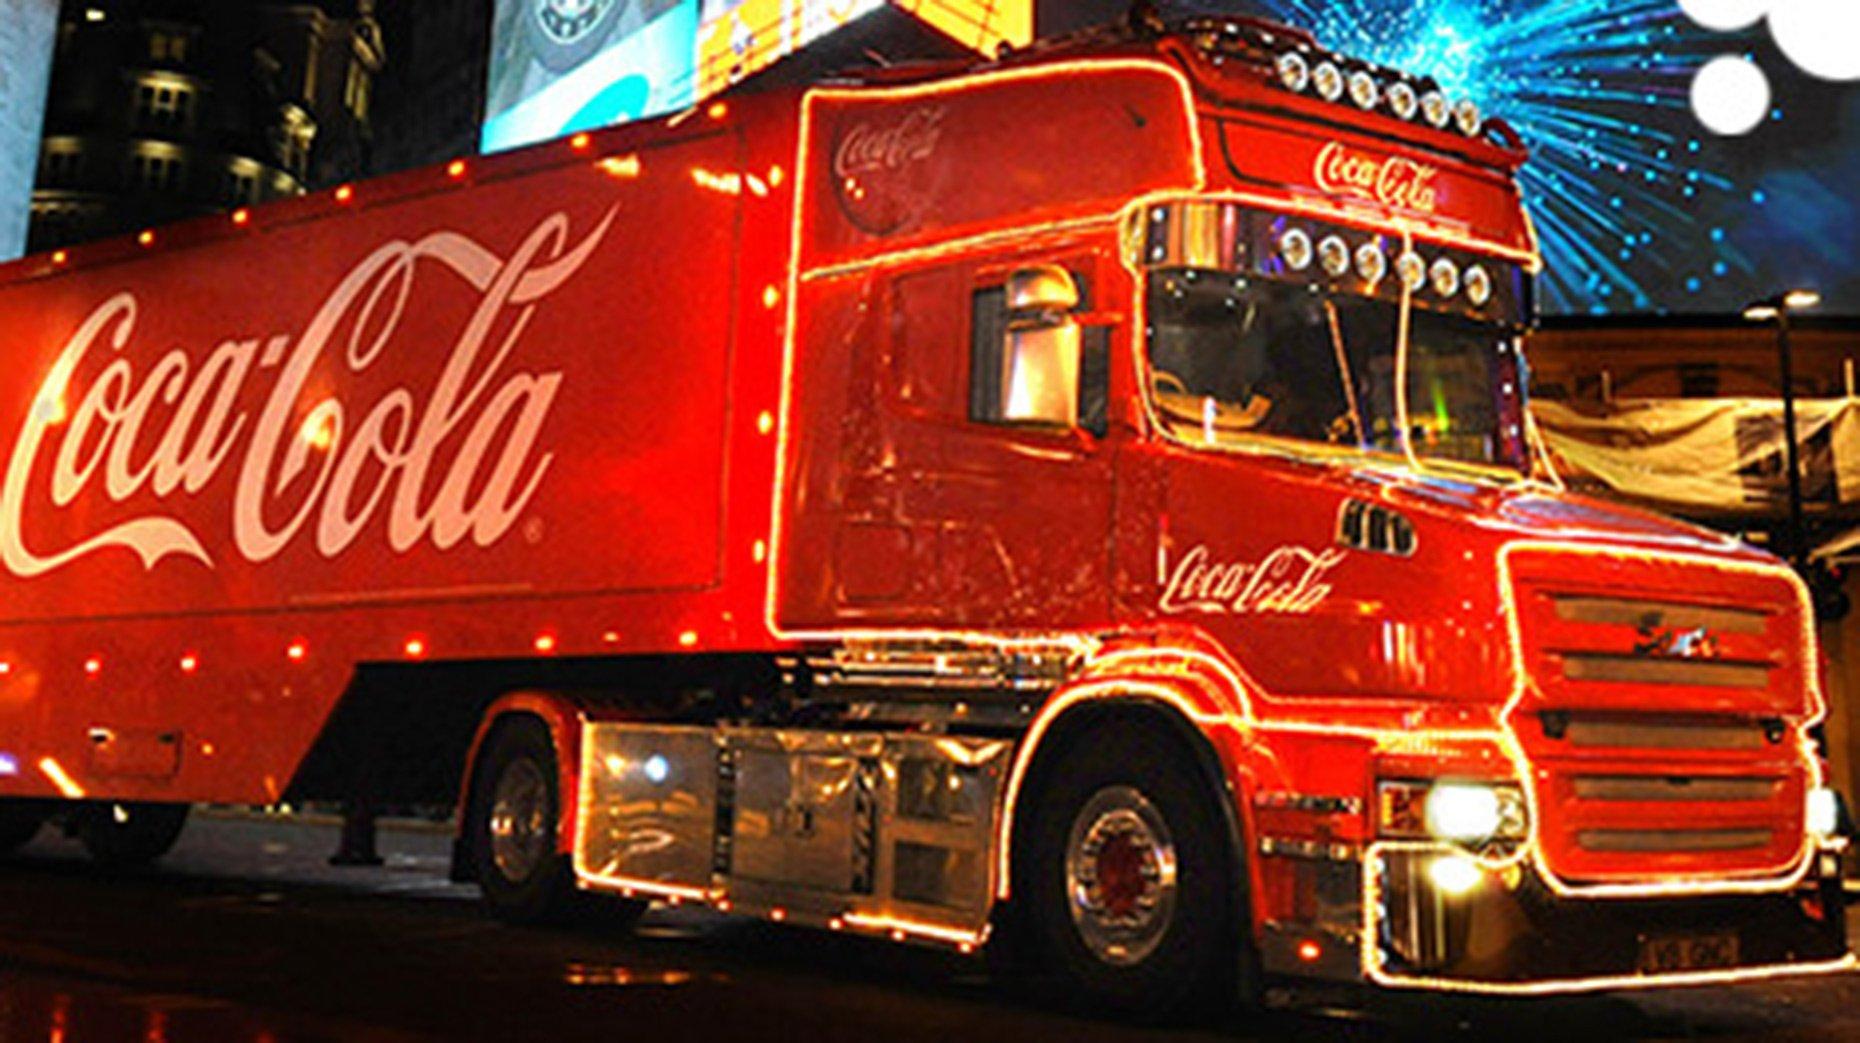 Coca Cola Christmas Truck To Make Lincoln Stop